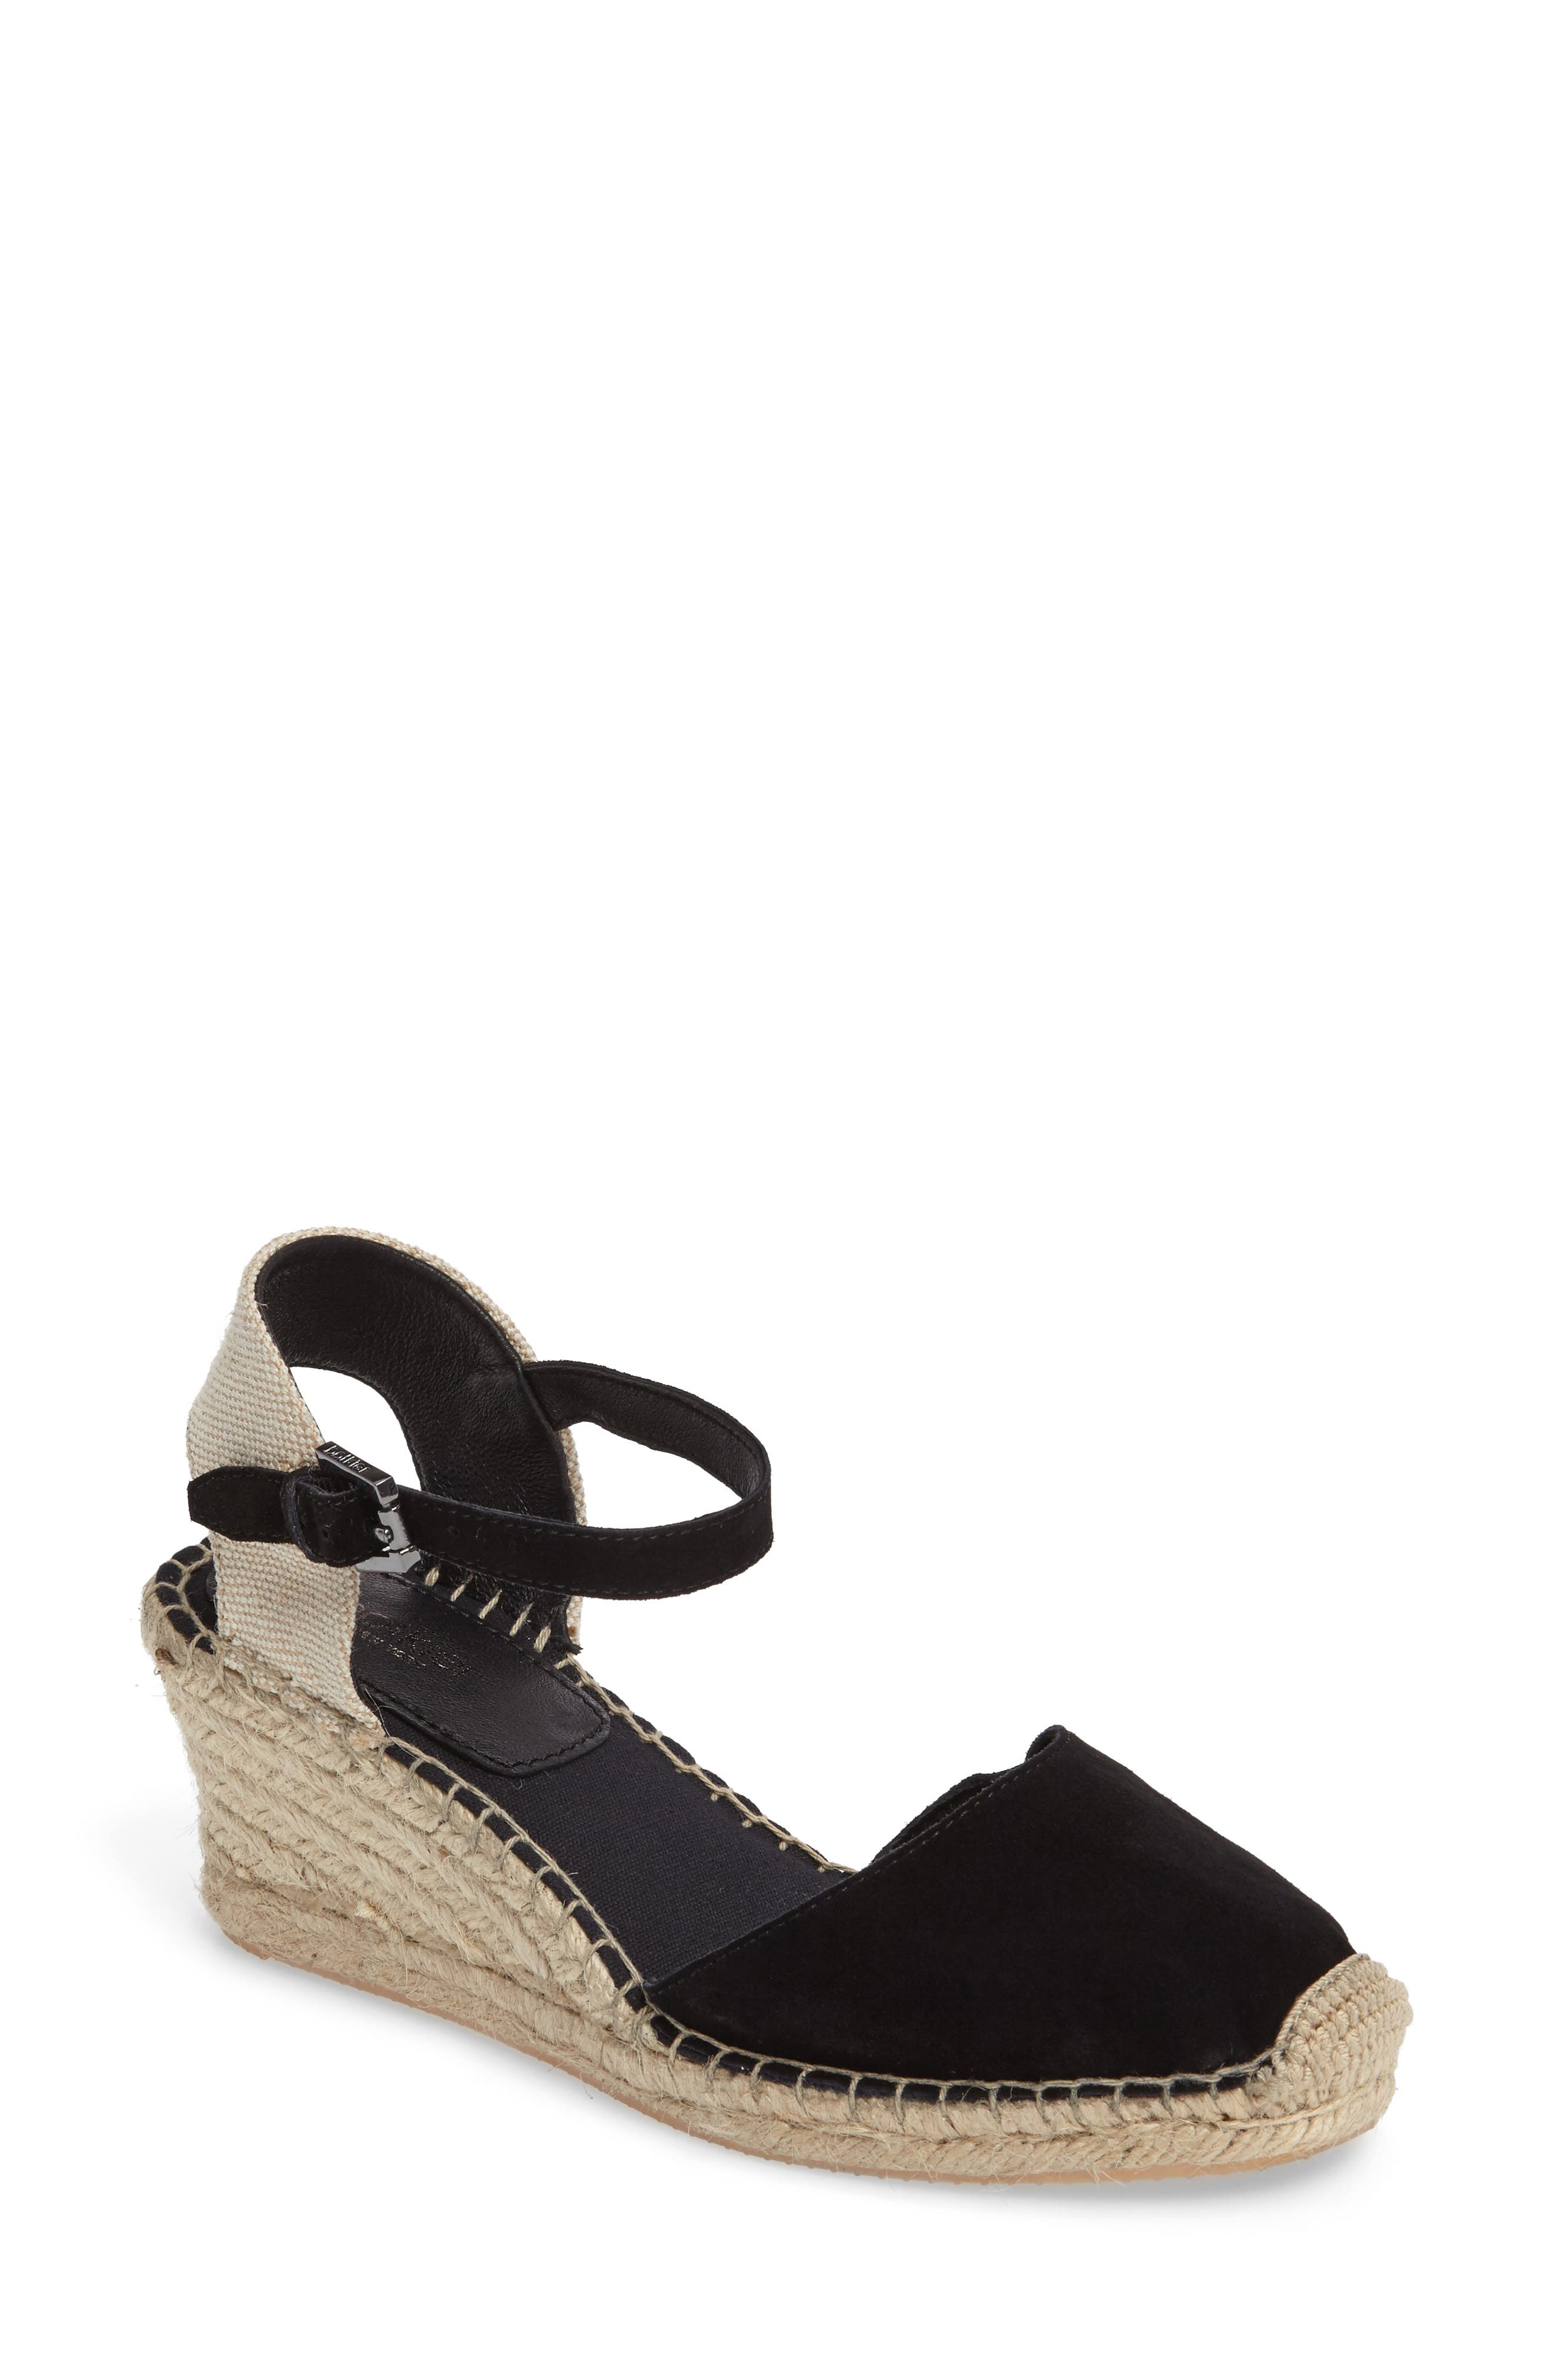 Elia Espadrille Wedge Sandal,                         Main,                         color, Black